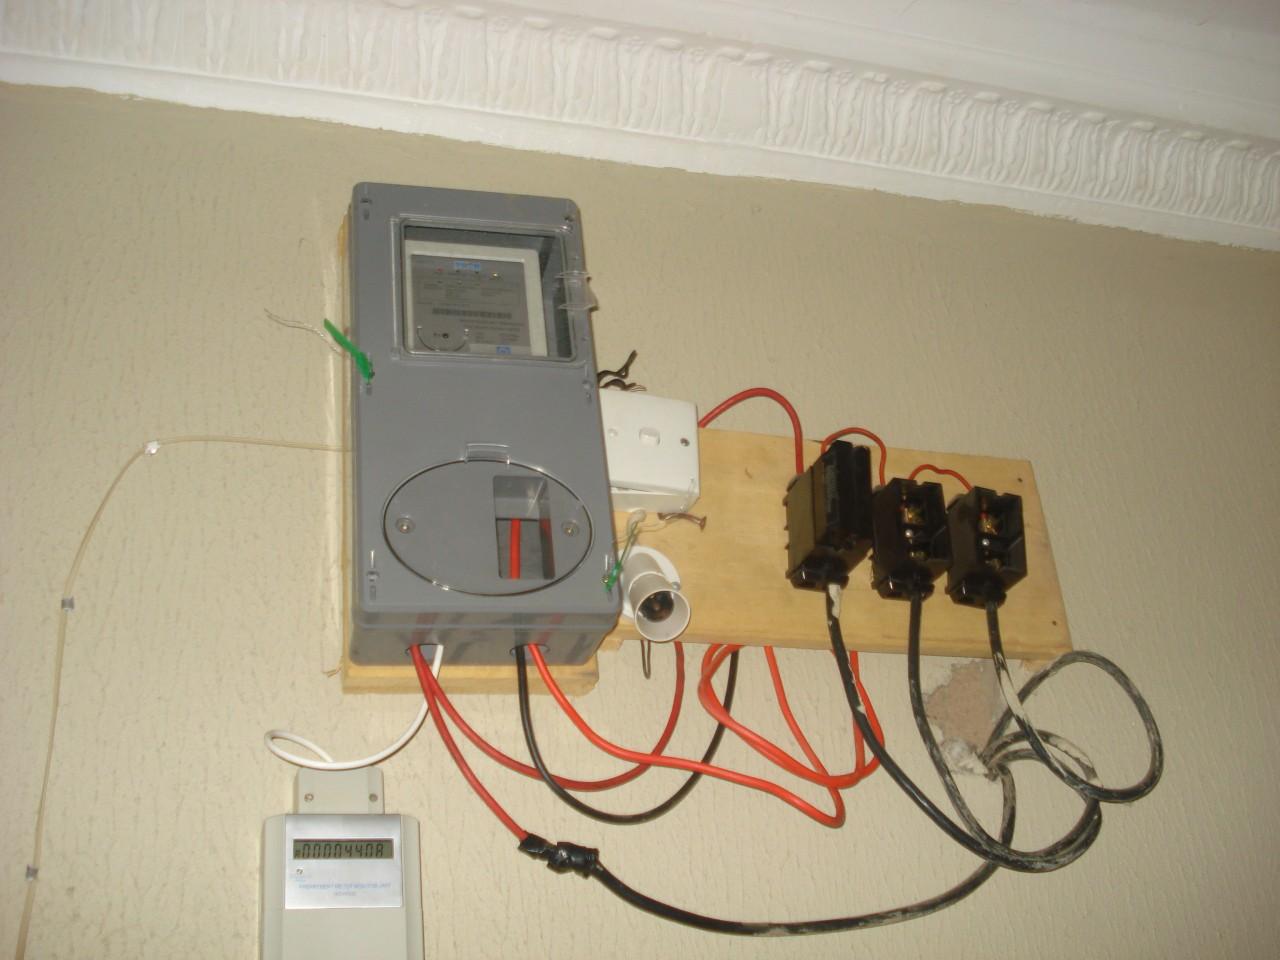 A prepaid meter in one of Nigerian Home //Photo: Sustain Nigeria